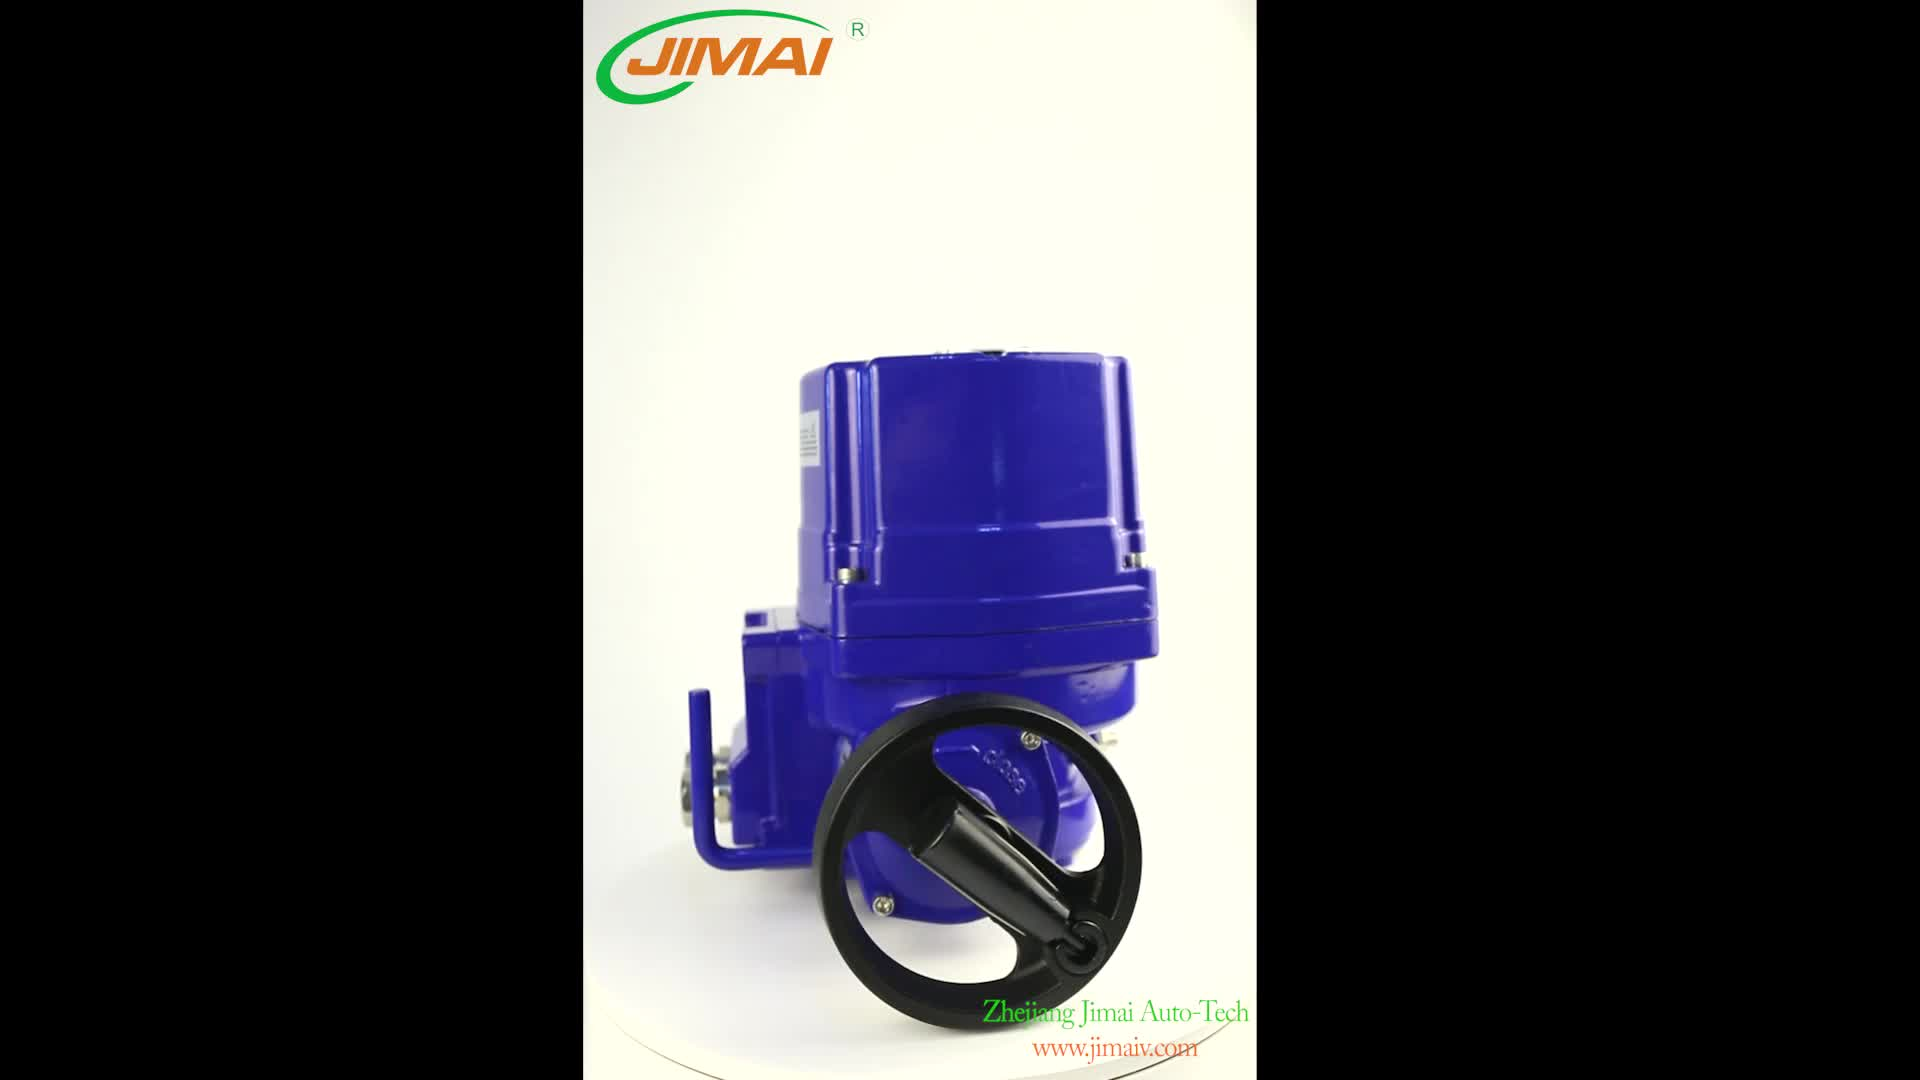 China Wholesale JIMAI QT Quarter Turn Electric Actuator Valve